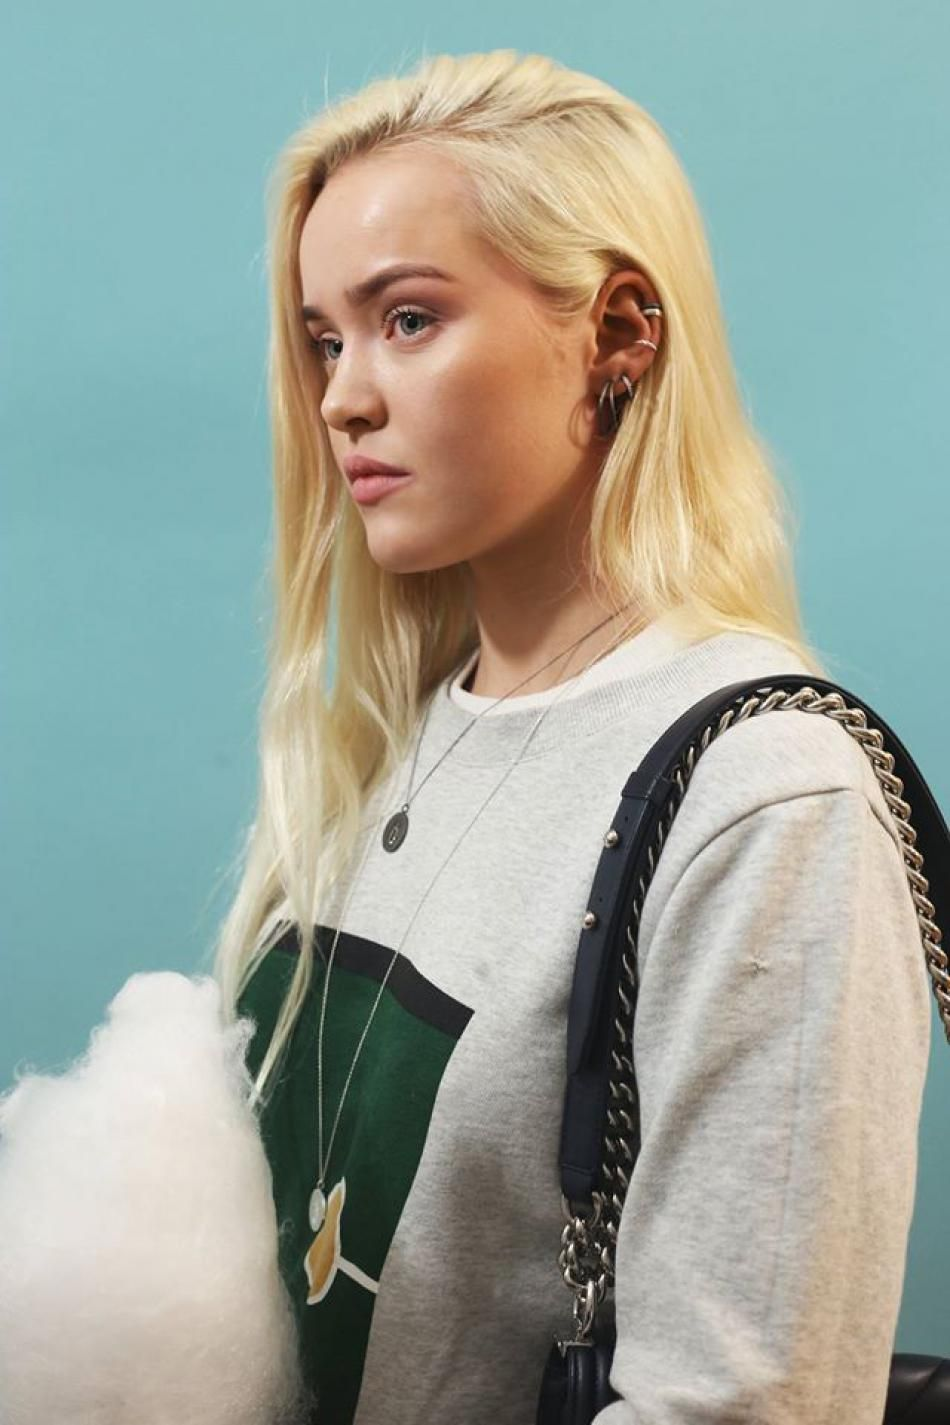 Styling by asdismargret showing Osiris Shiny Pendant Grey Rhodium, Osiris Shiny Pendant Silver and Loop Earring Fine Grey Rhodium #jewellery #Jewelry #bangles #amulet #dogtag #medallion #choker #charms #Pendant #Earring #EarringBackPeace #EarJacket #EarSticks #Necklace #Earcuff #Bracelet #Minimal #minimalistic #ContemporaryJewellery #zirkonia #Gemstone #JewelleryStone #JewelleryDesign #CreativeJewellery #OxidizedJewellery #gold #silver #rosegold #hoops #armcuff #jewls #jewelleryInspiration…